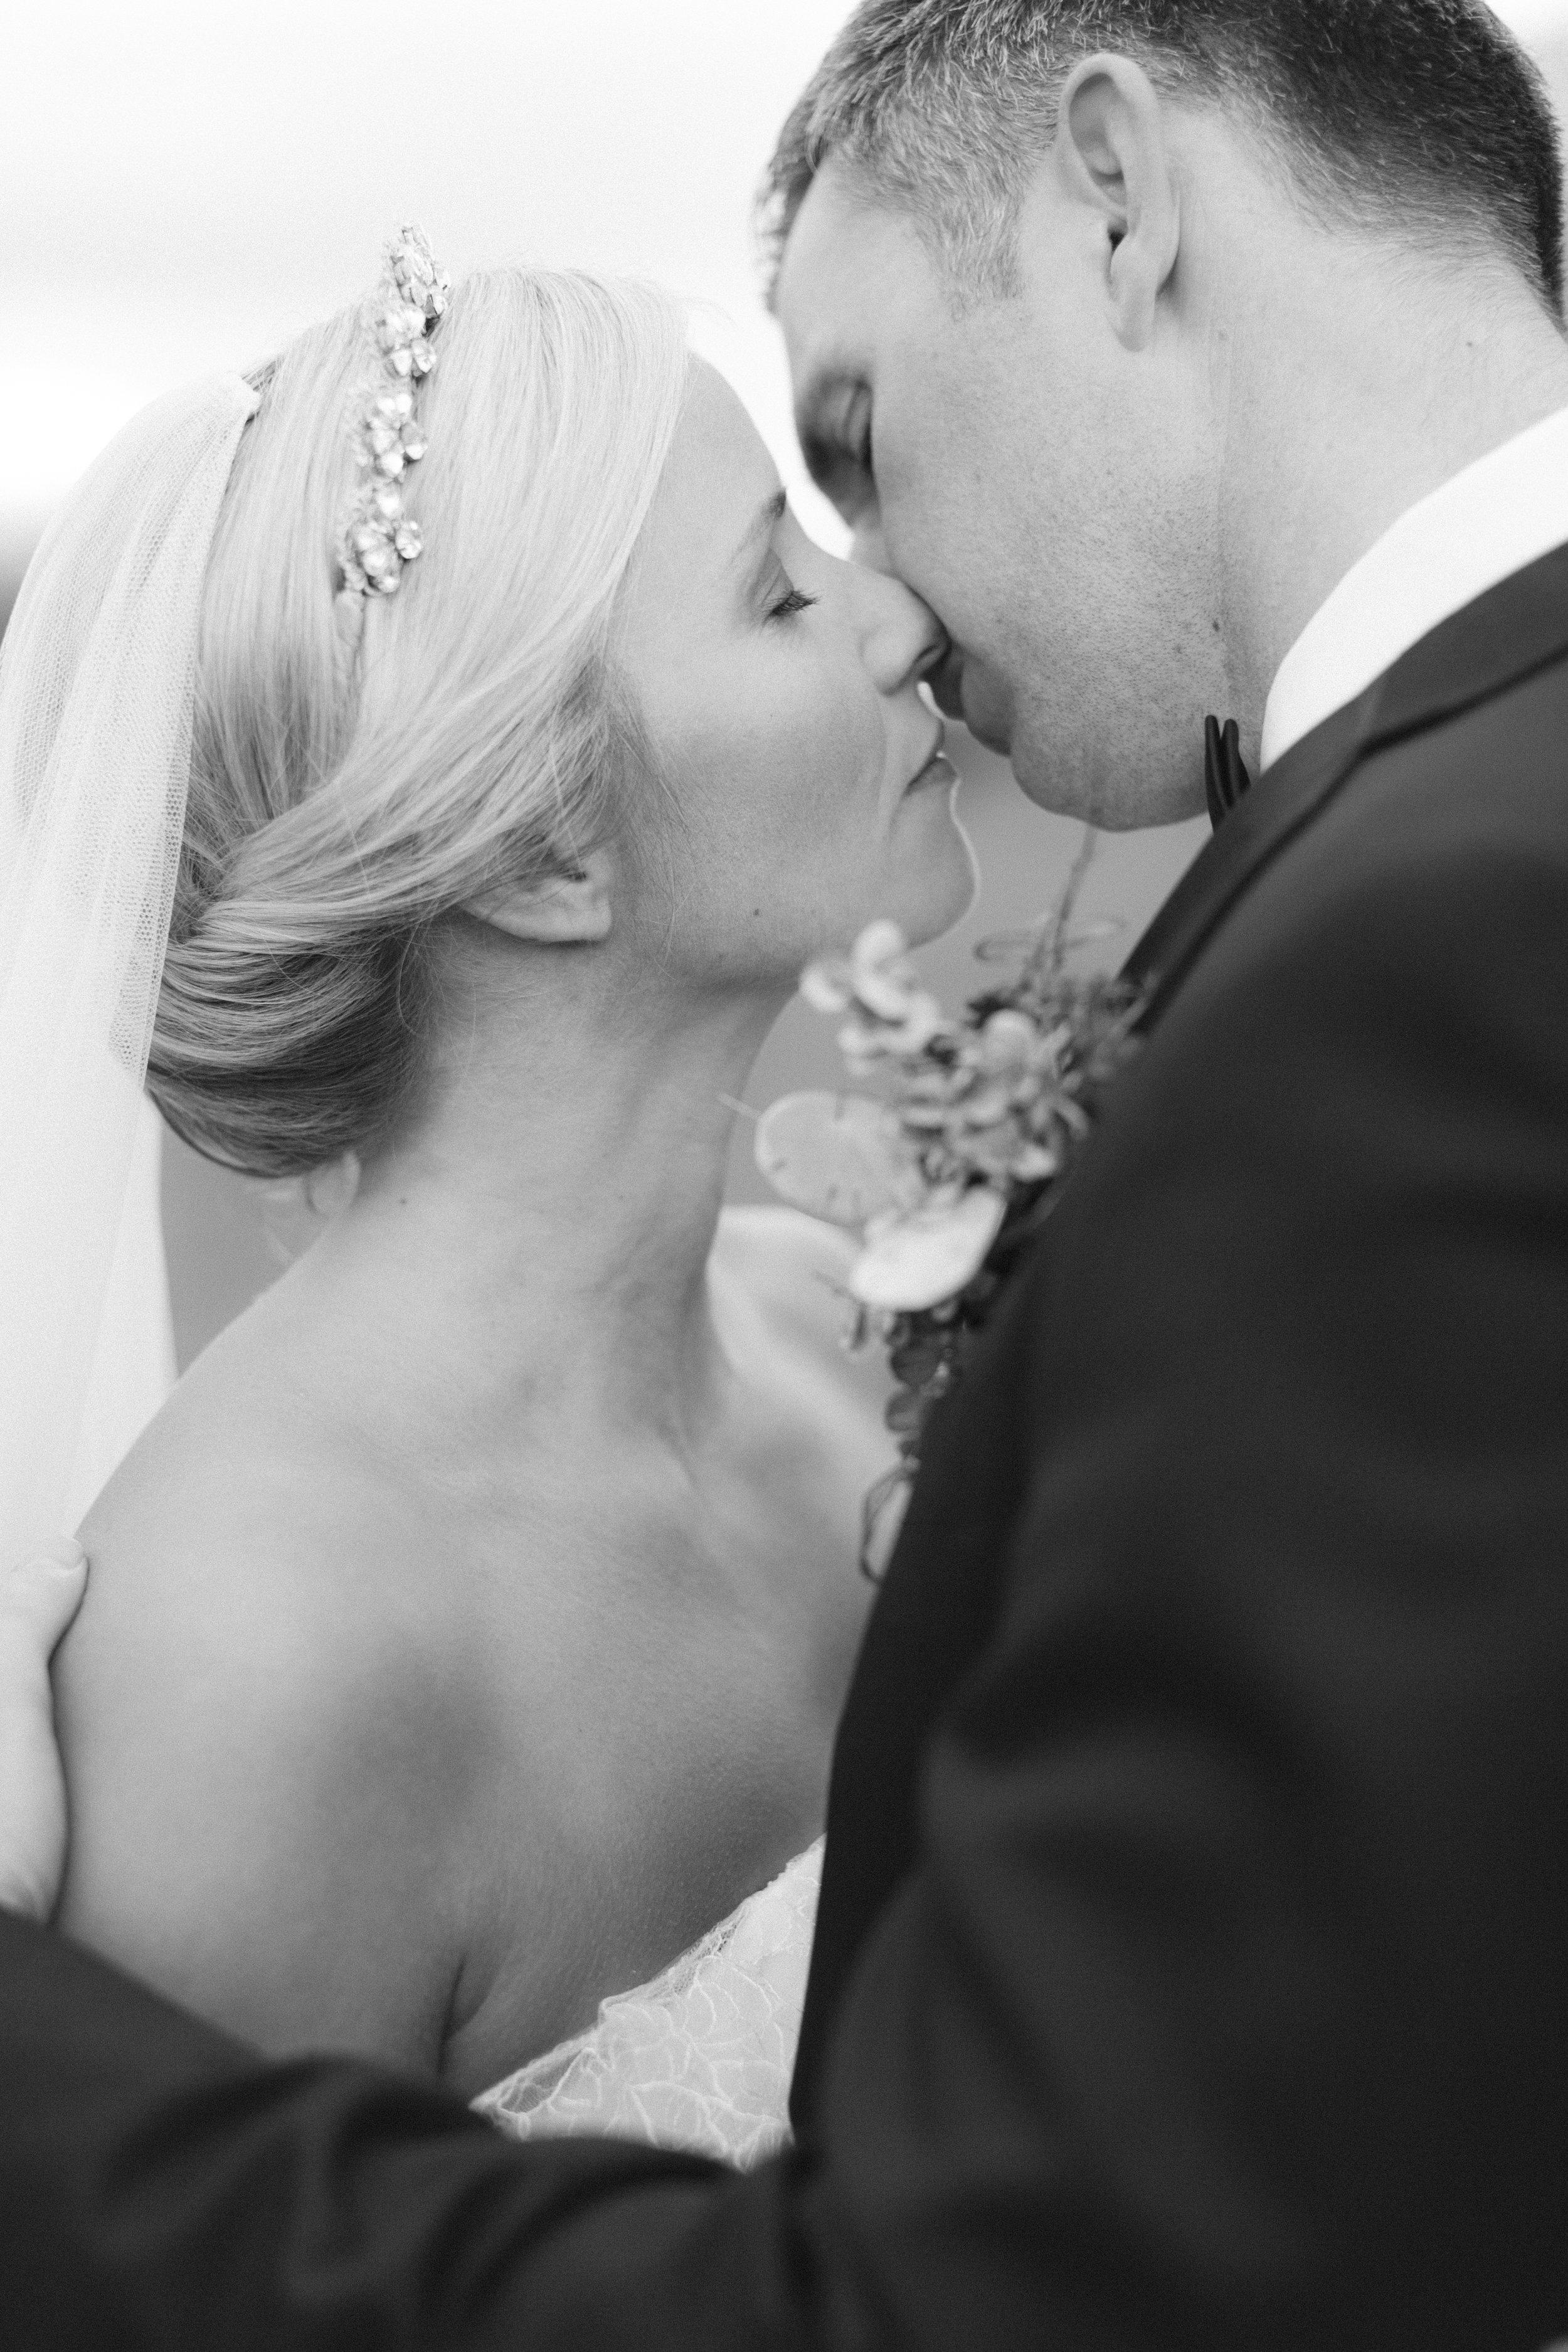 Wedding Fine Art Photography_Just Merried_Bride and Groom_UK_Joana Senkute Photography_BelleAndBeauWorkshop_Yorkshire